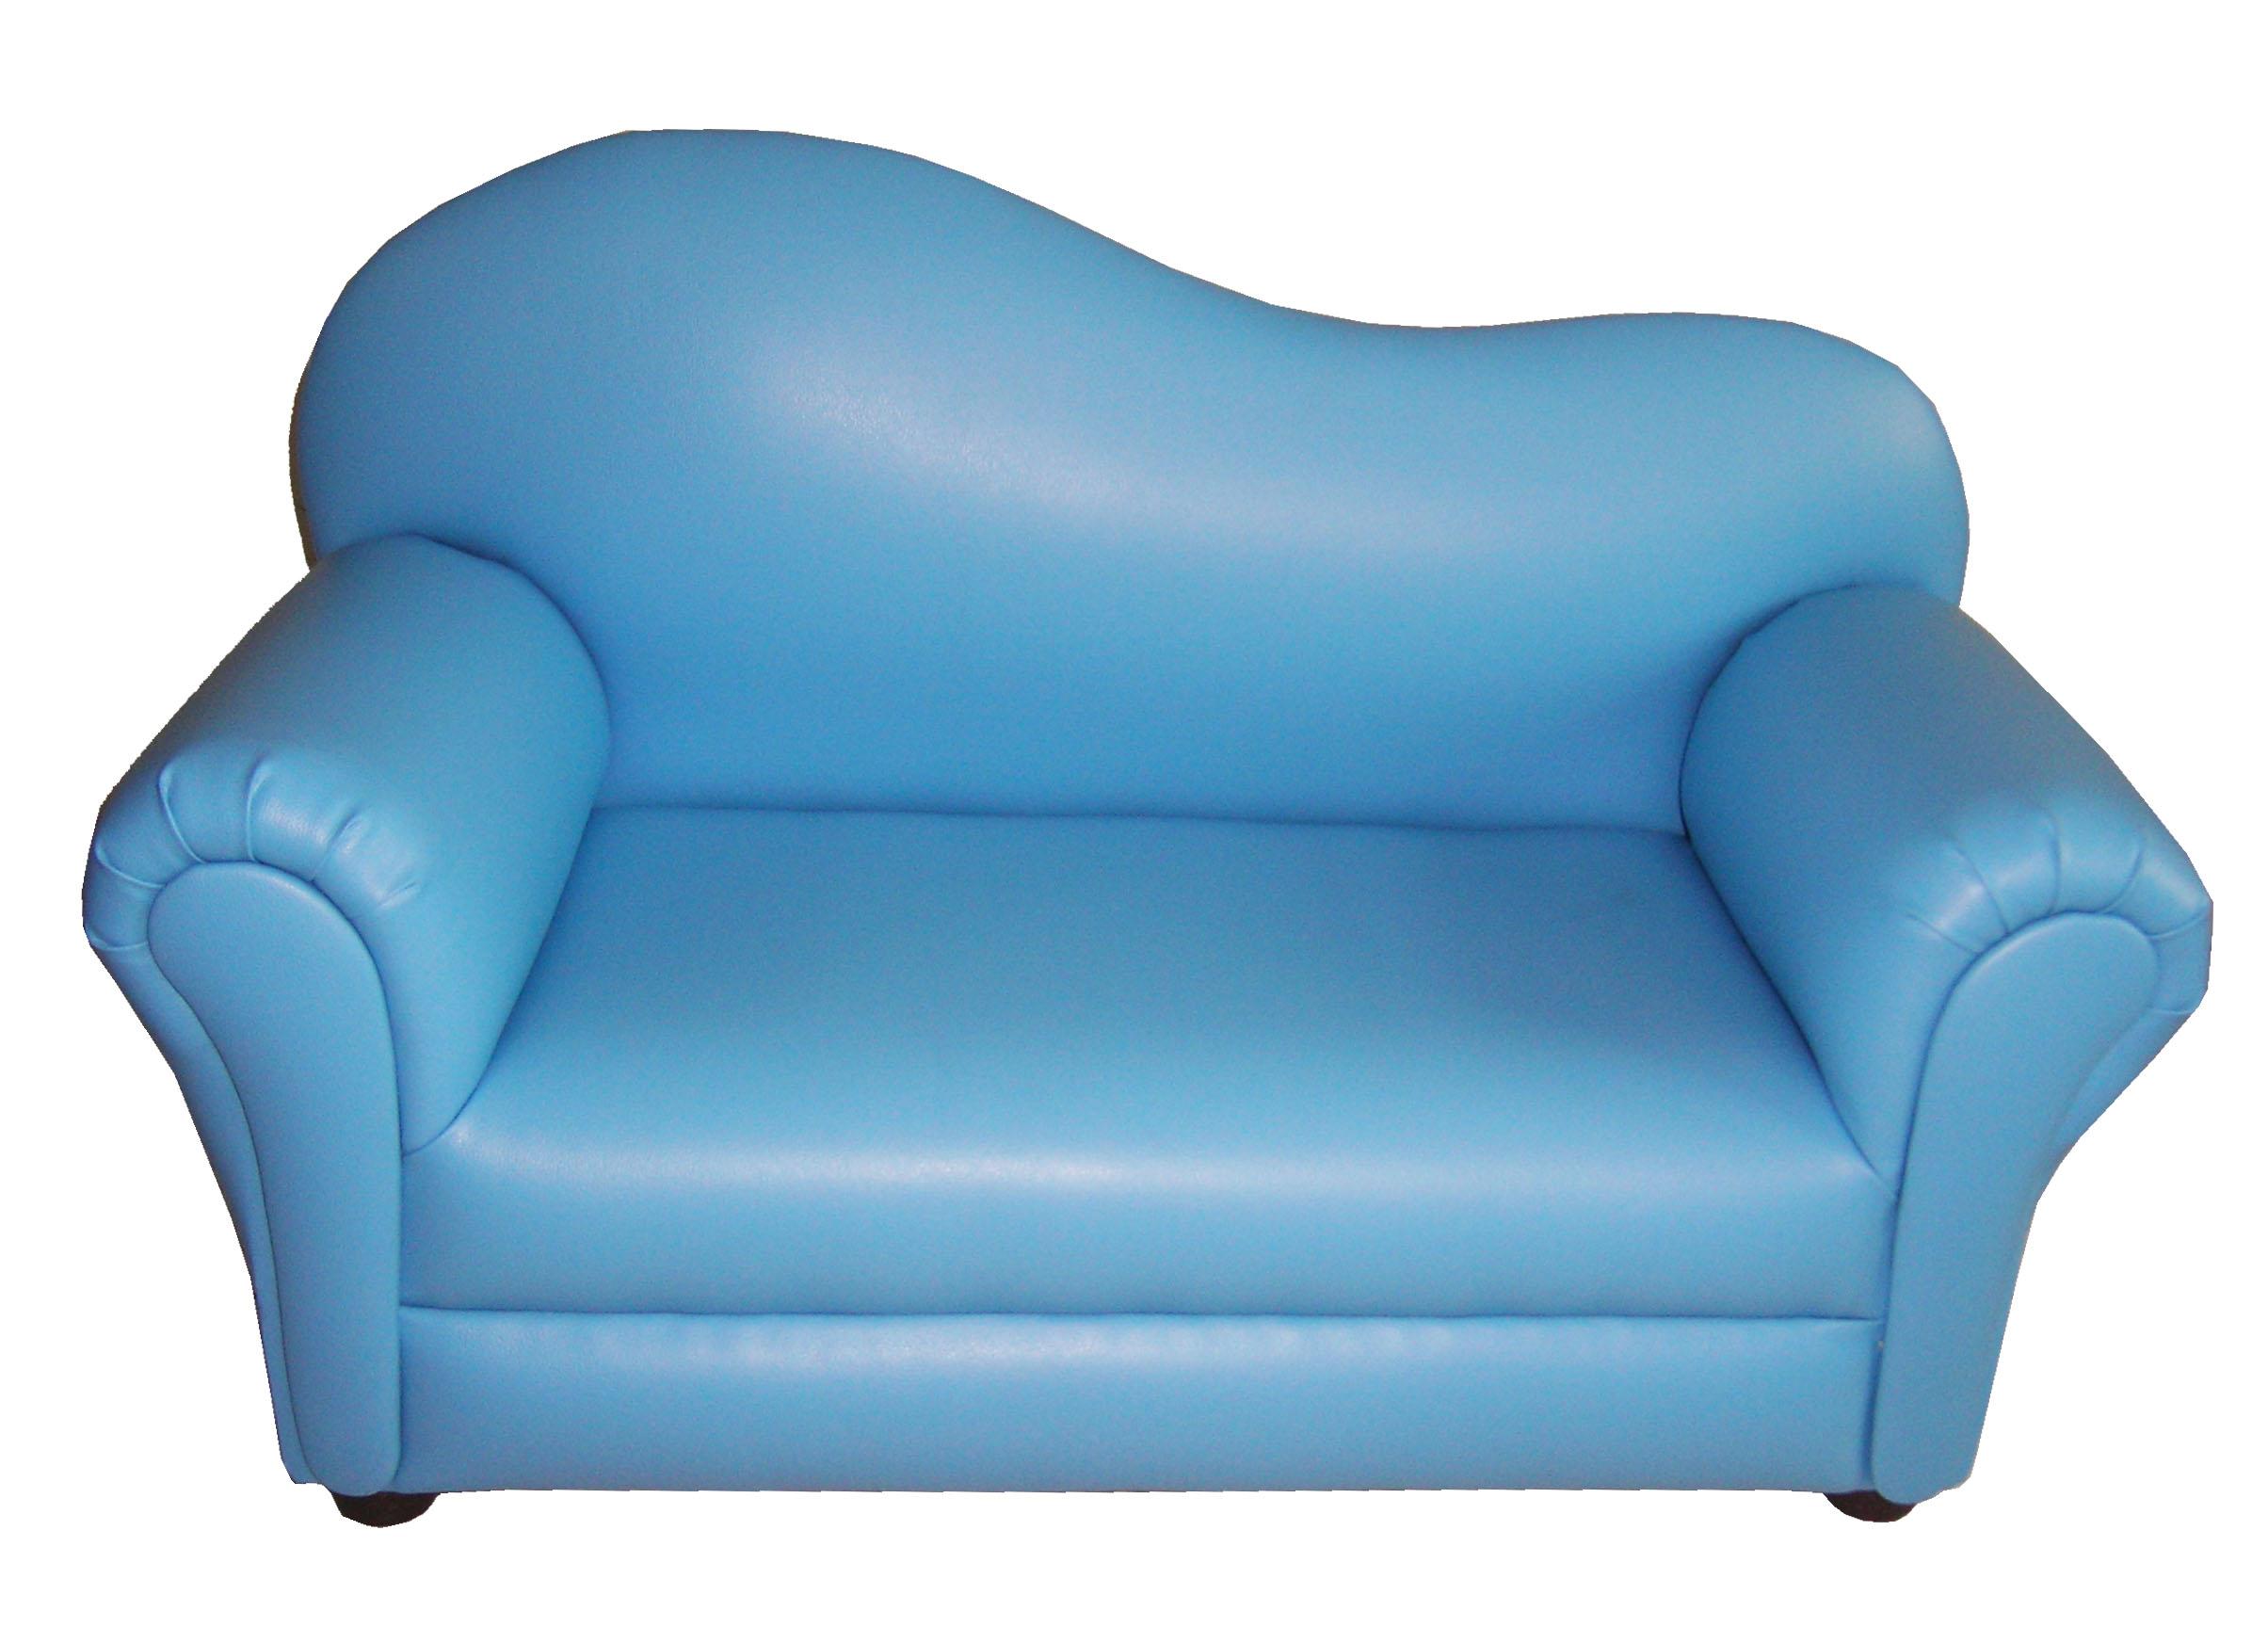 Children Kids Child Sofa Furniture Armchair Couch Seat Chair